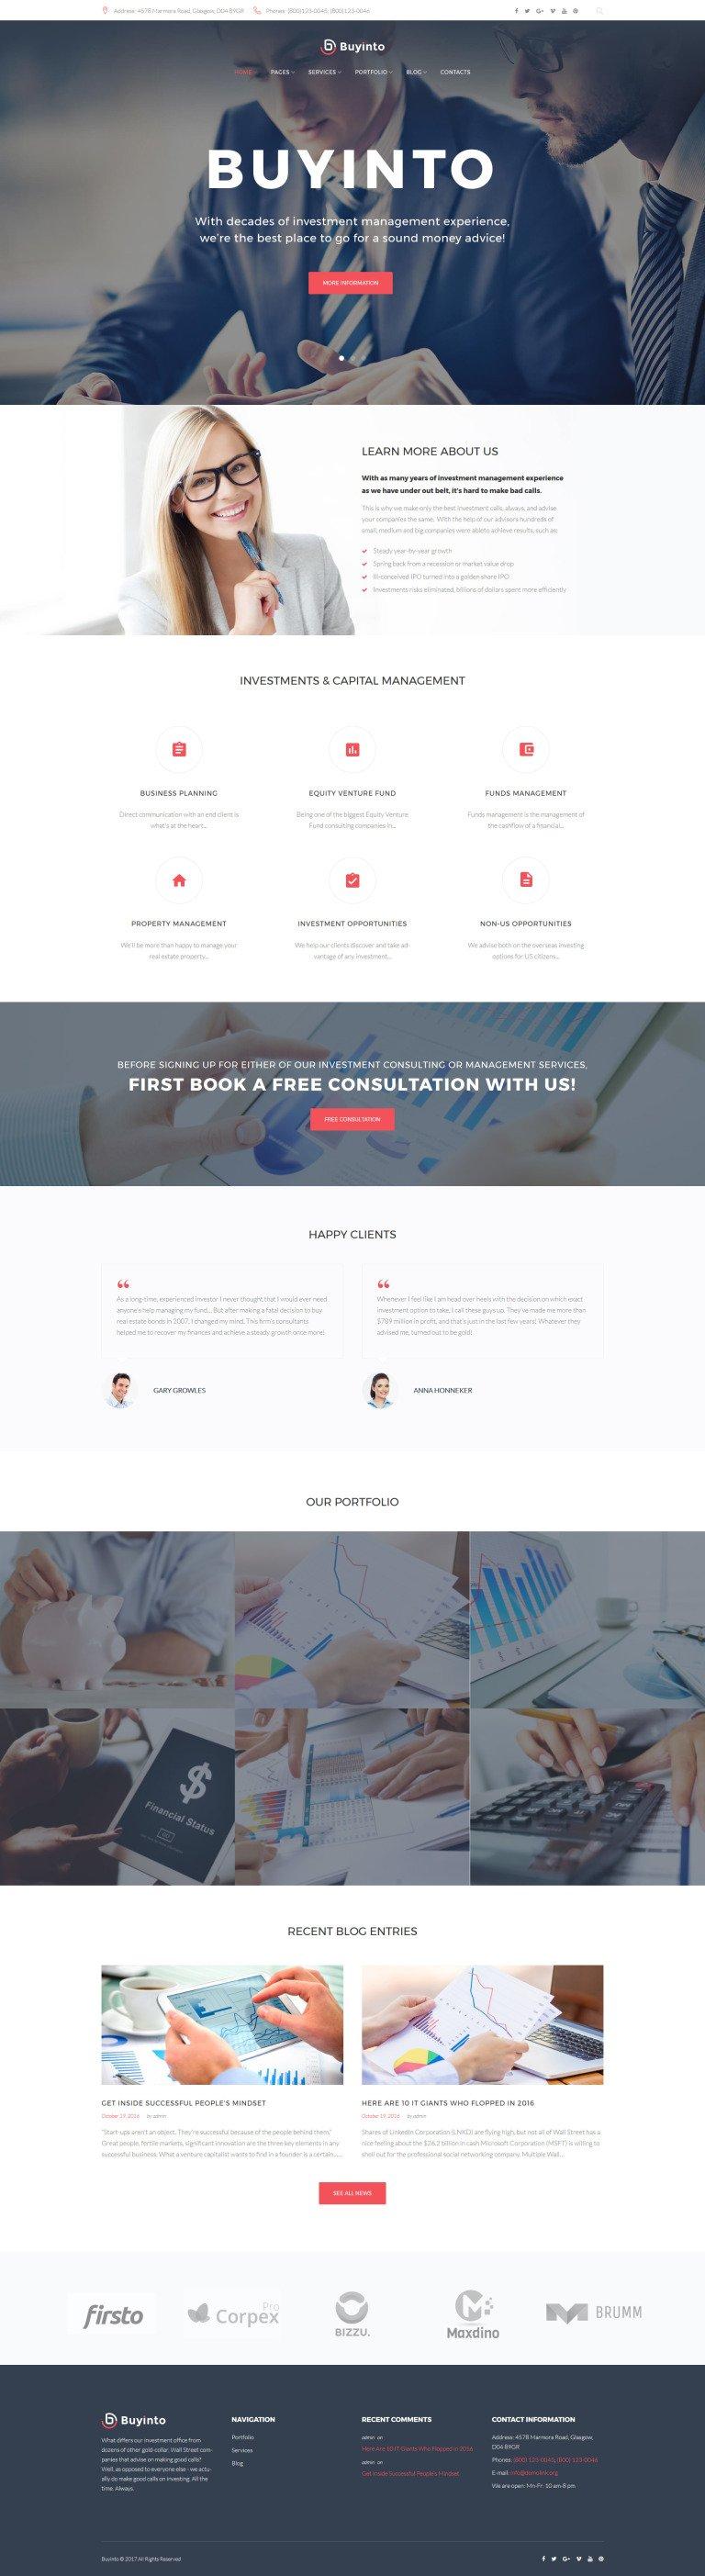 Business Investment & Management WordPress Theme New Screenshots BIG